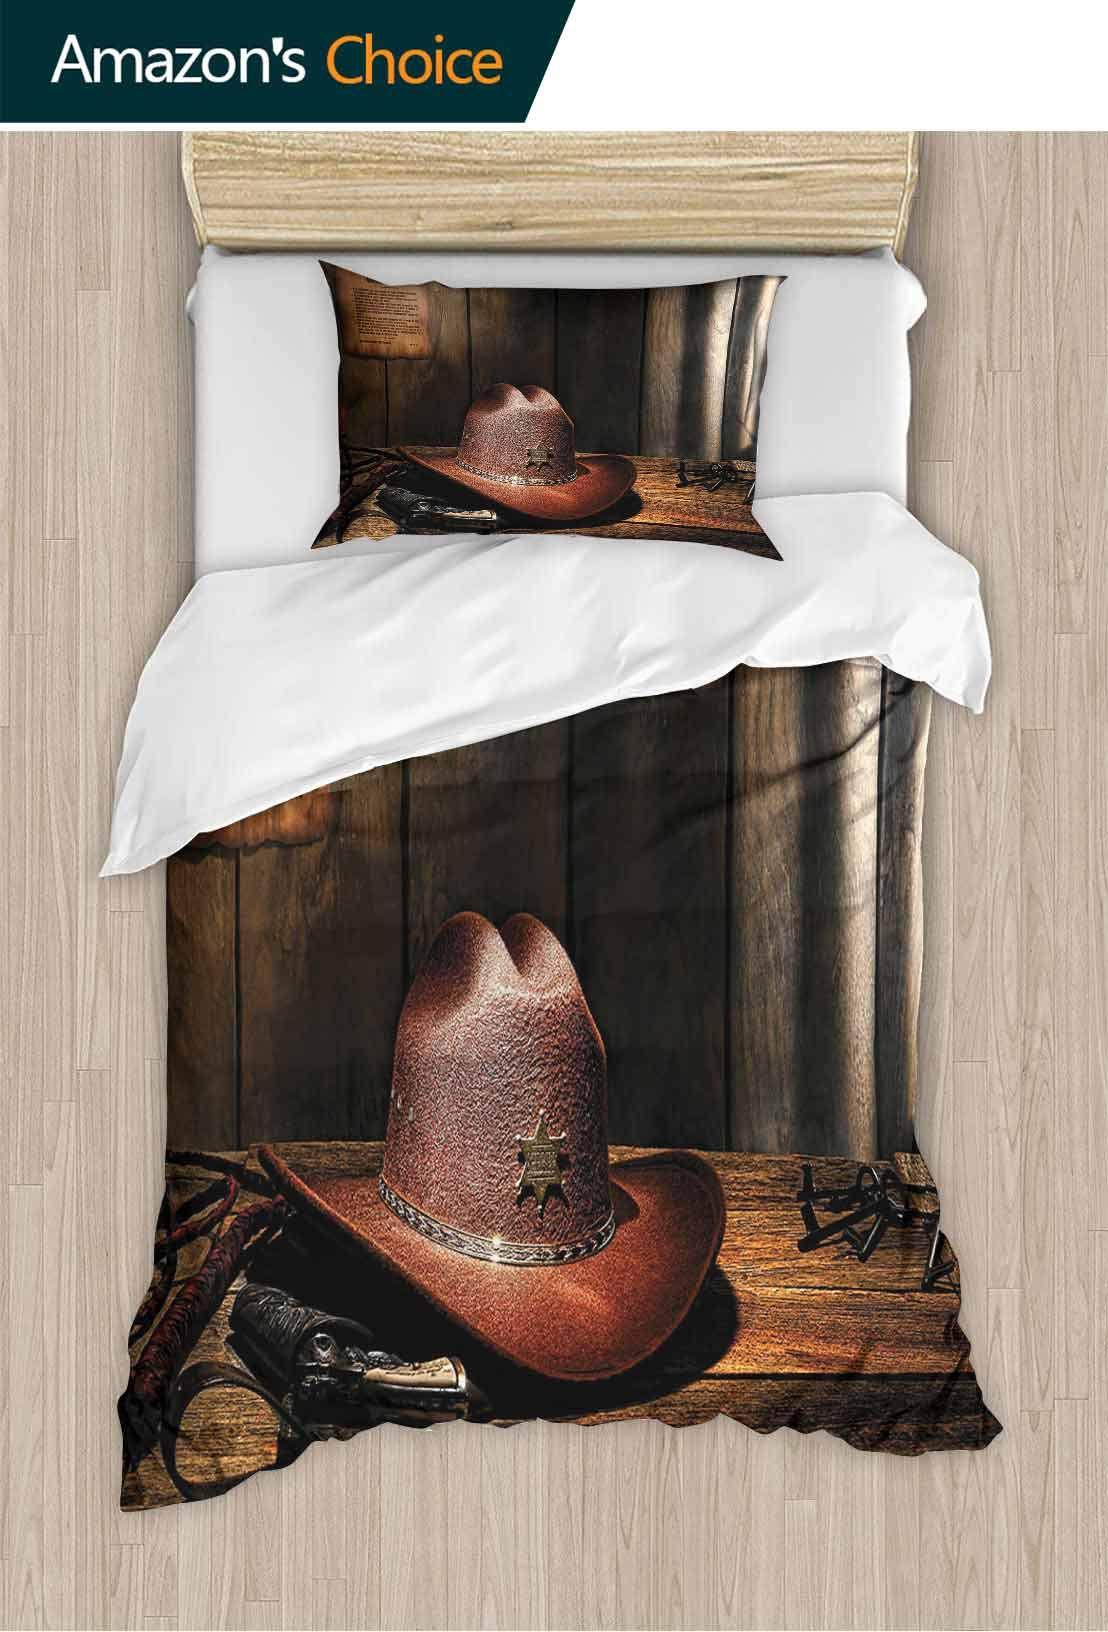 PRUNUSHOME Softest Bedding Felt W Tern Hat Sheriff Table Old Lawman Gun Bullwhip Jail Work Soft and Comfortable King